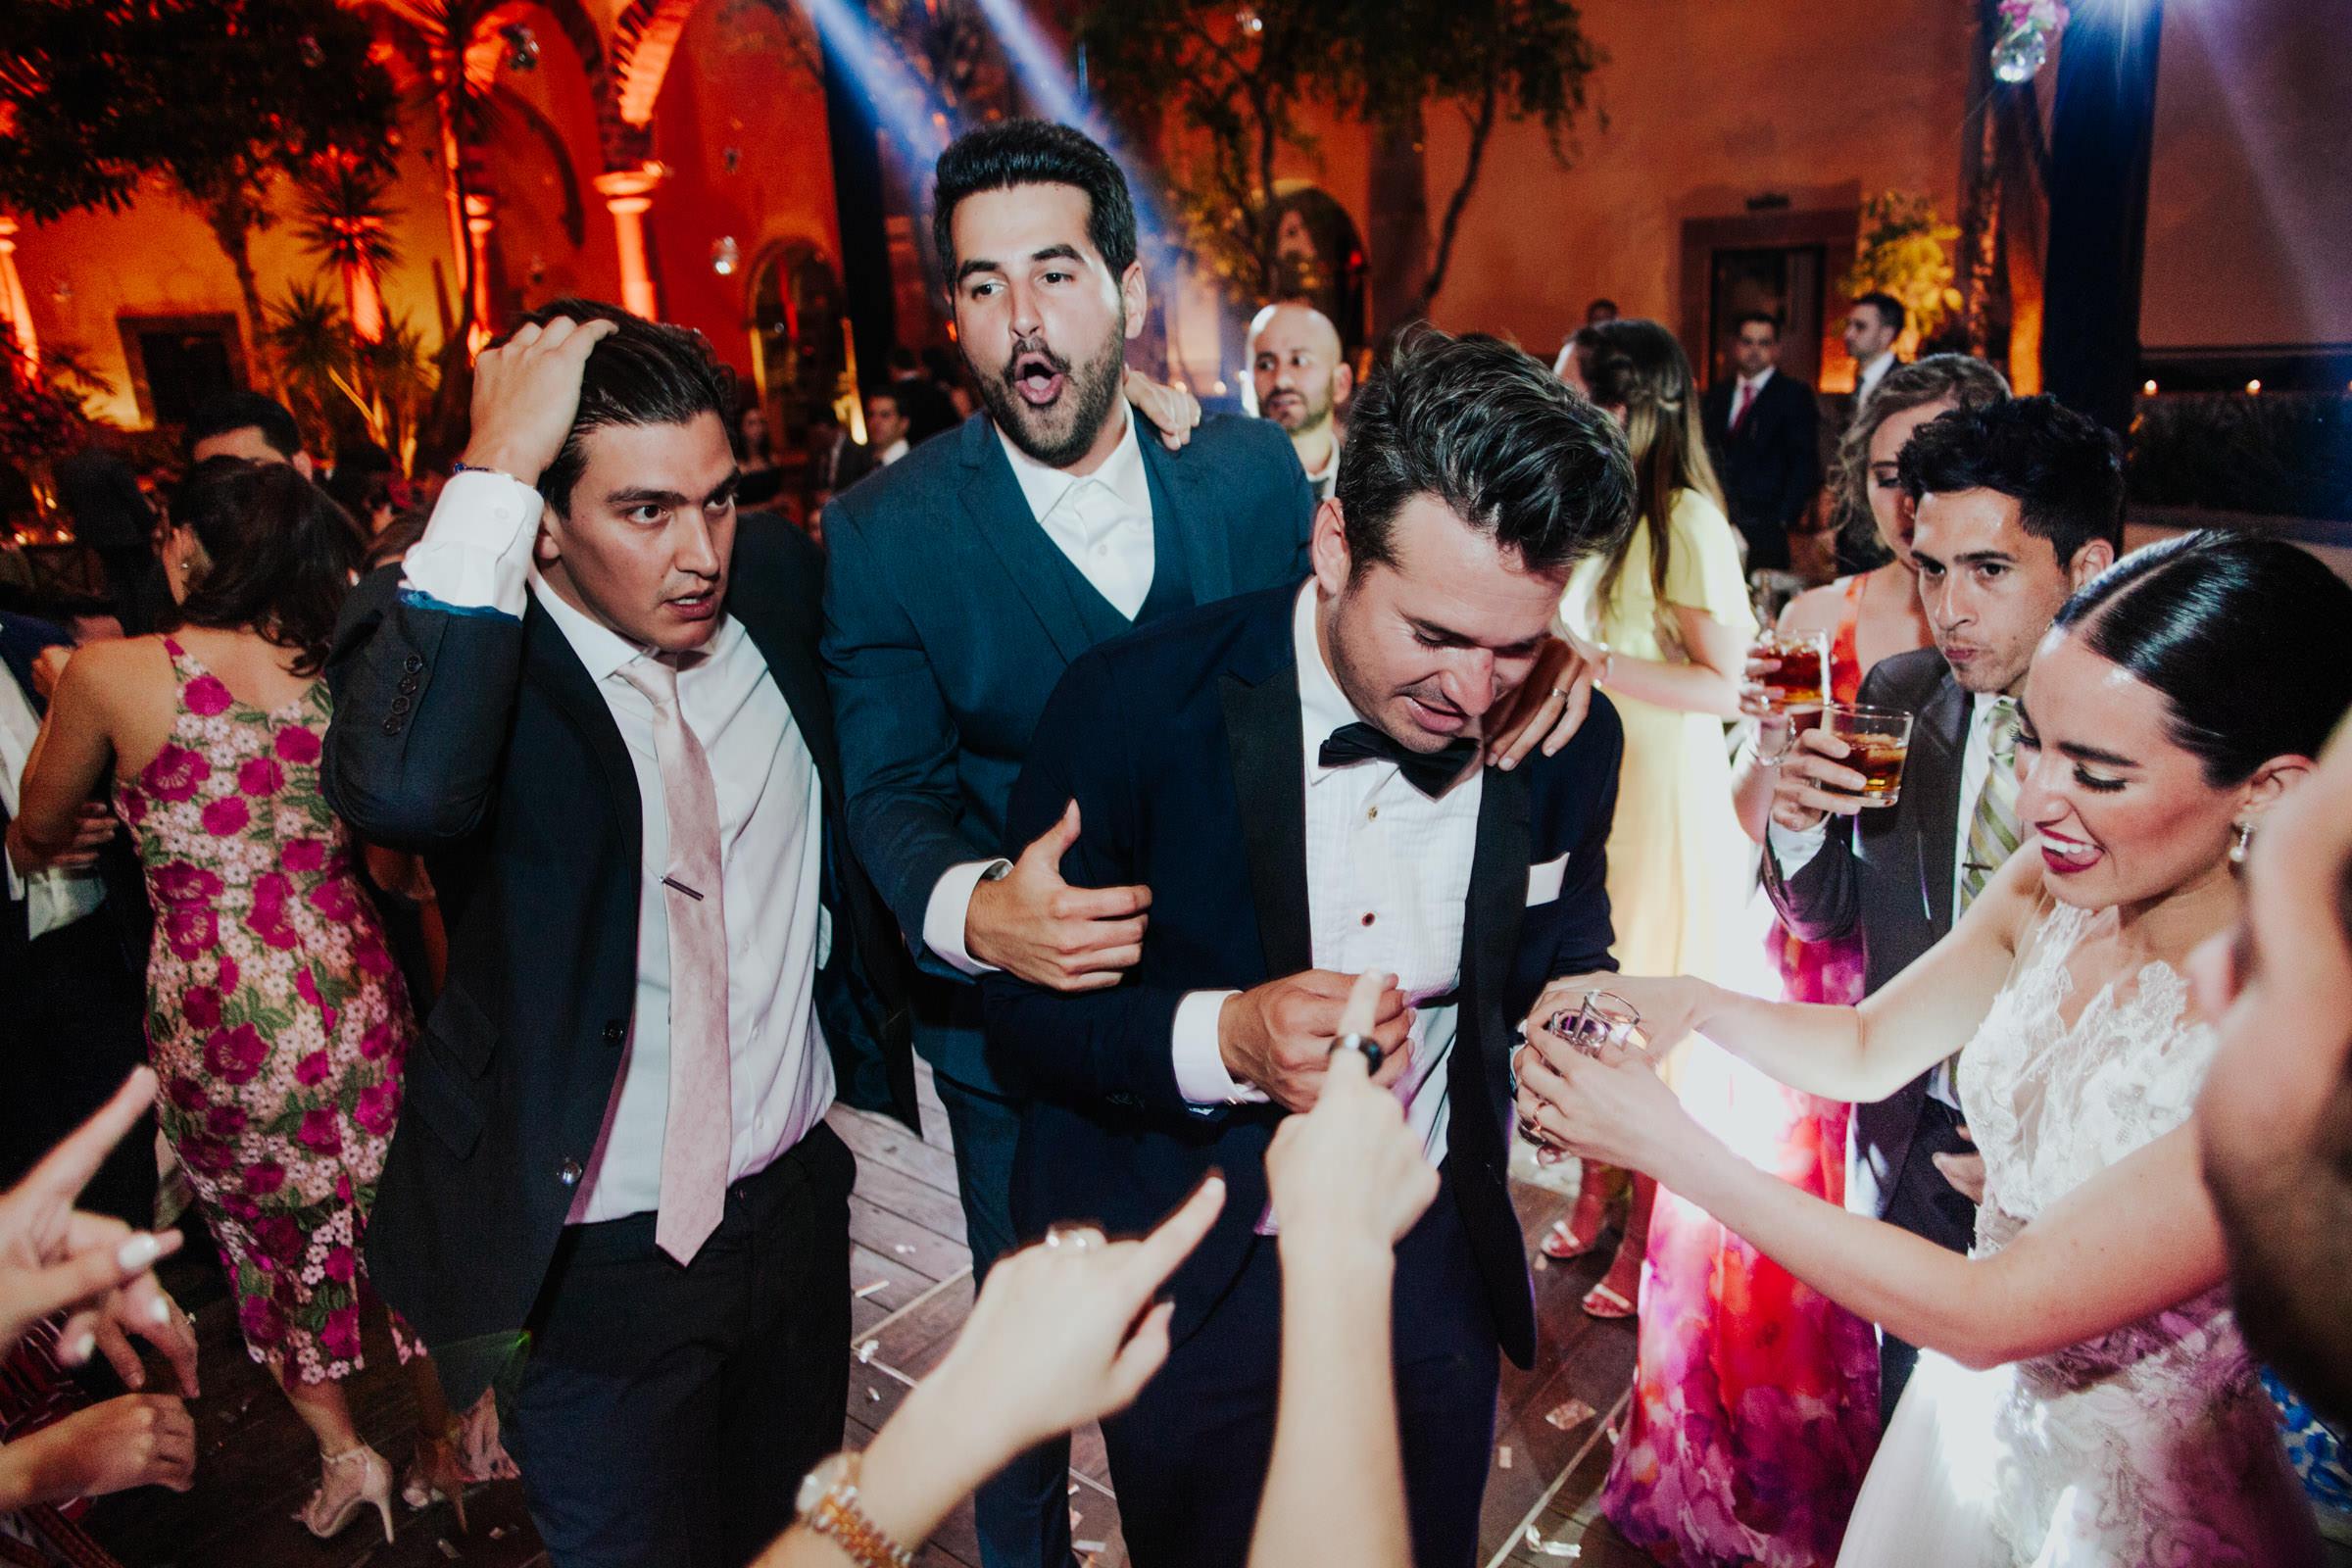 San-Miguel-de-Allende-Wedding-Photography-Parroquia-Instituto-Boda-Fotografia-Fer-Sergio-Pierce-Lifestyle-Photography0071.JPG